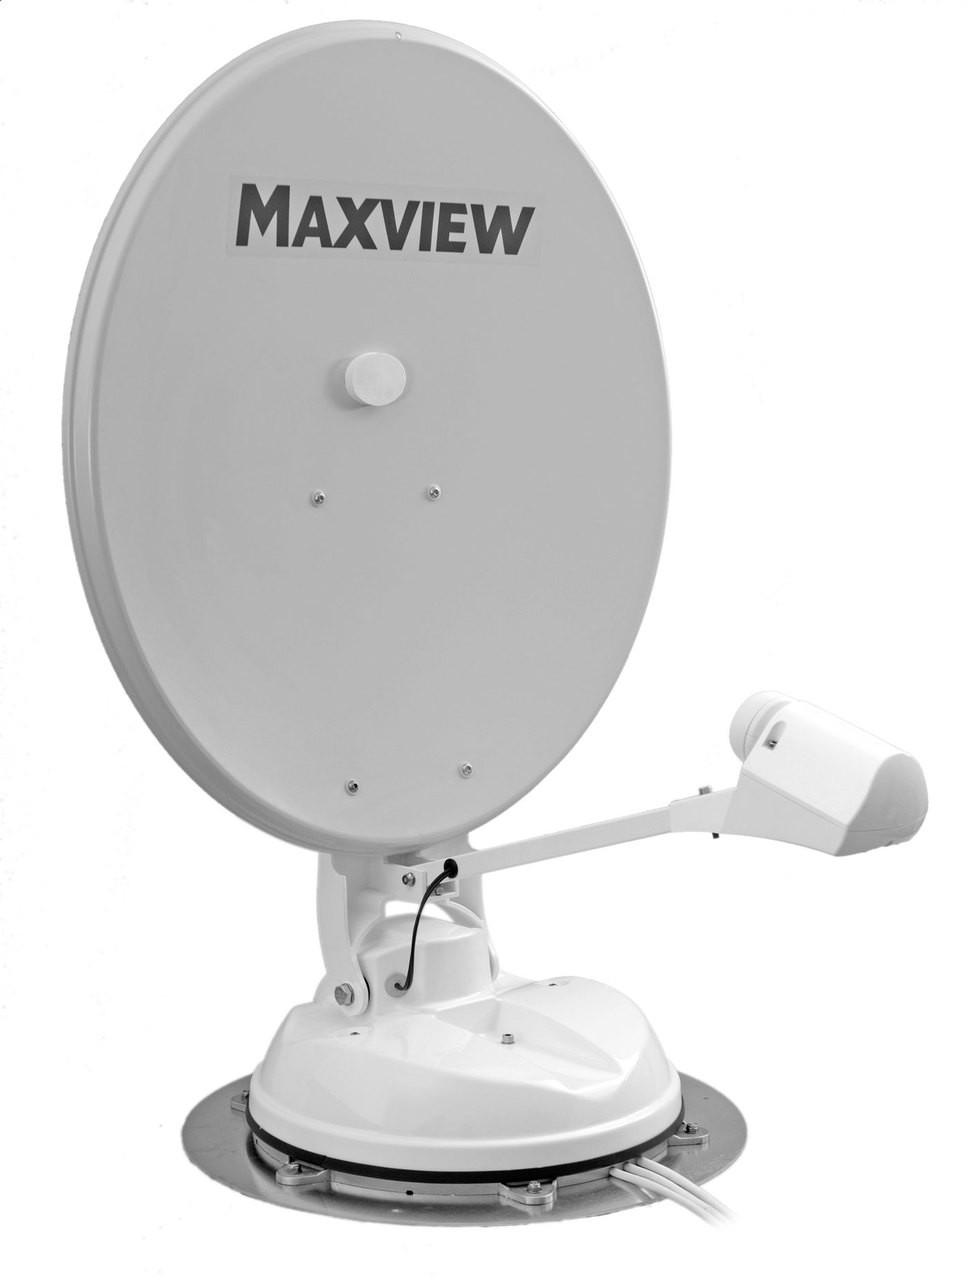 Maxview Crank Up Next Generation Caravan And Motorhome